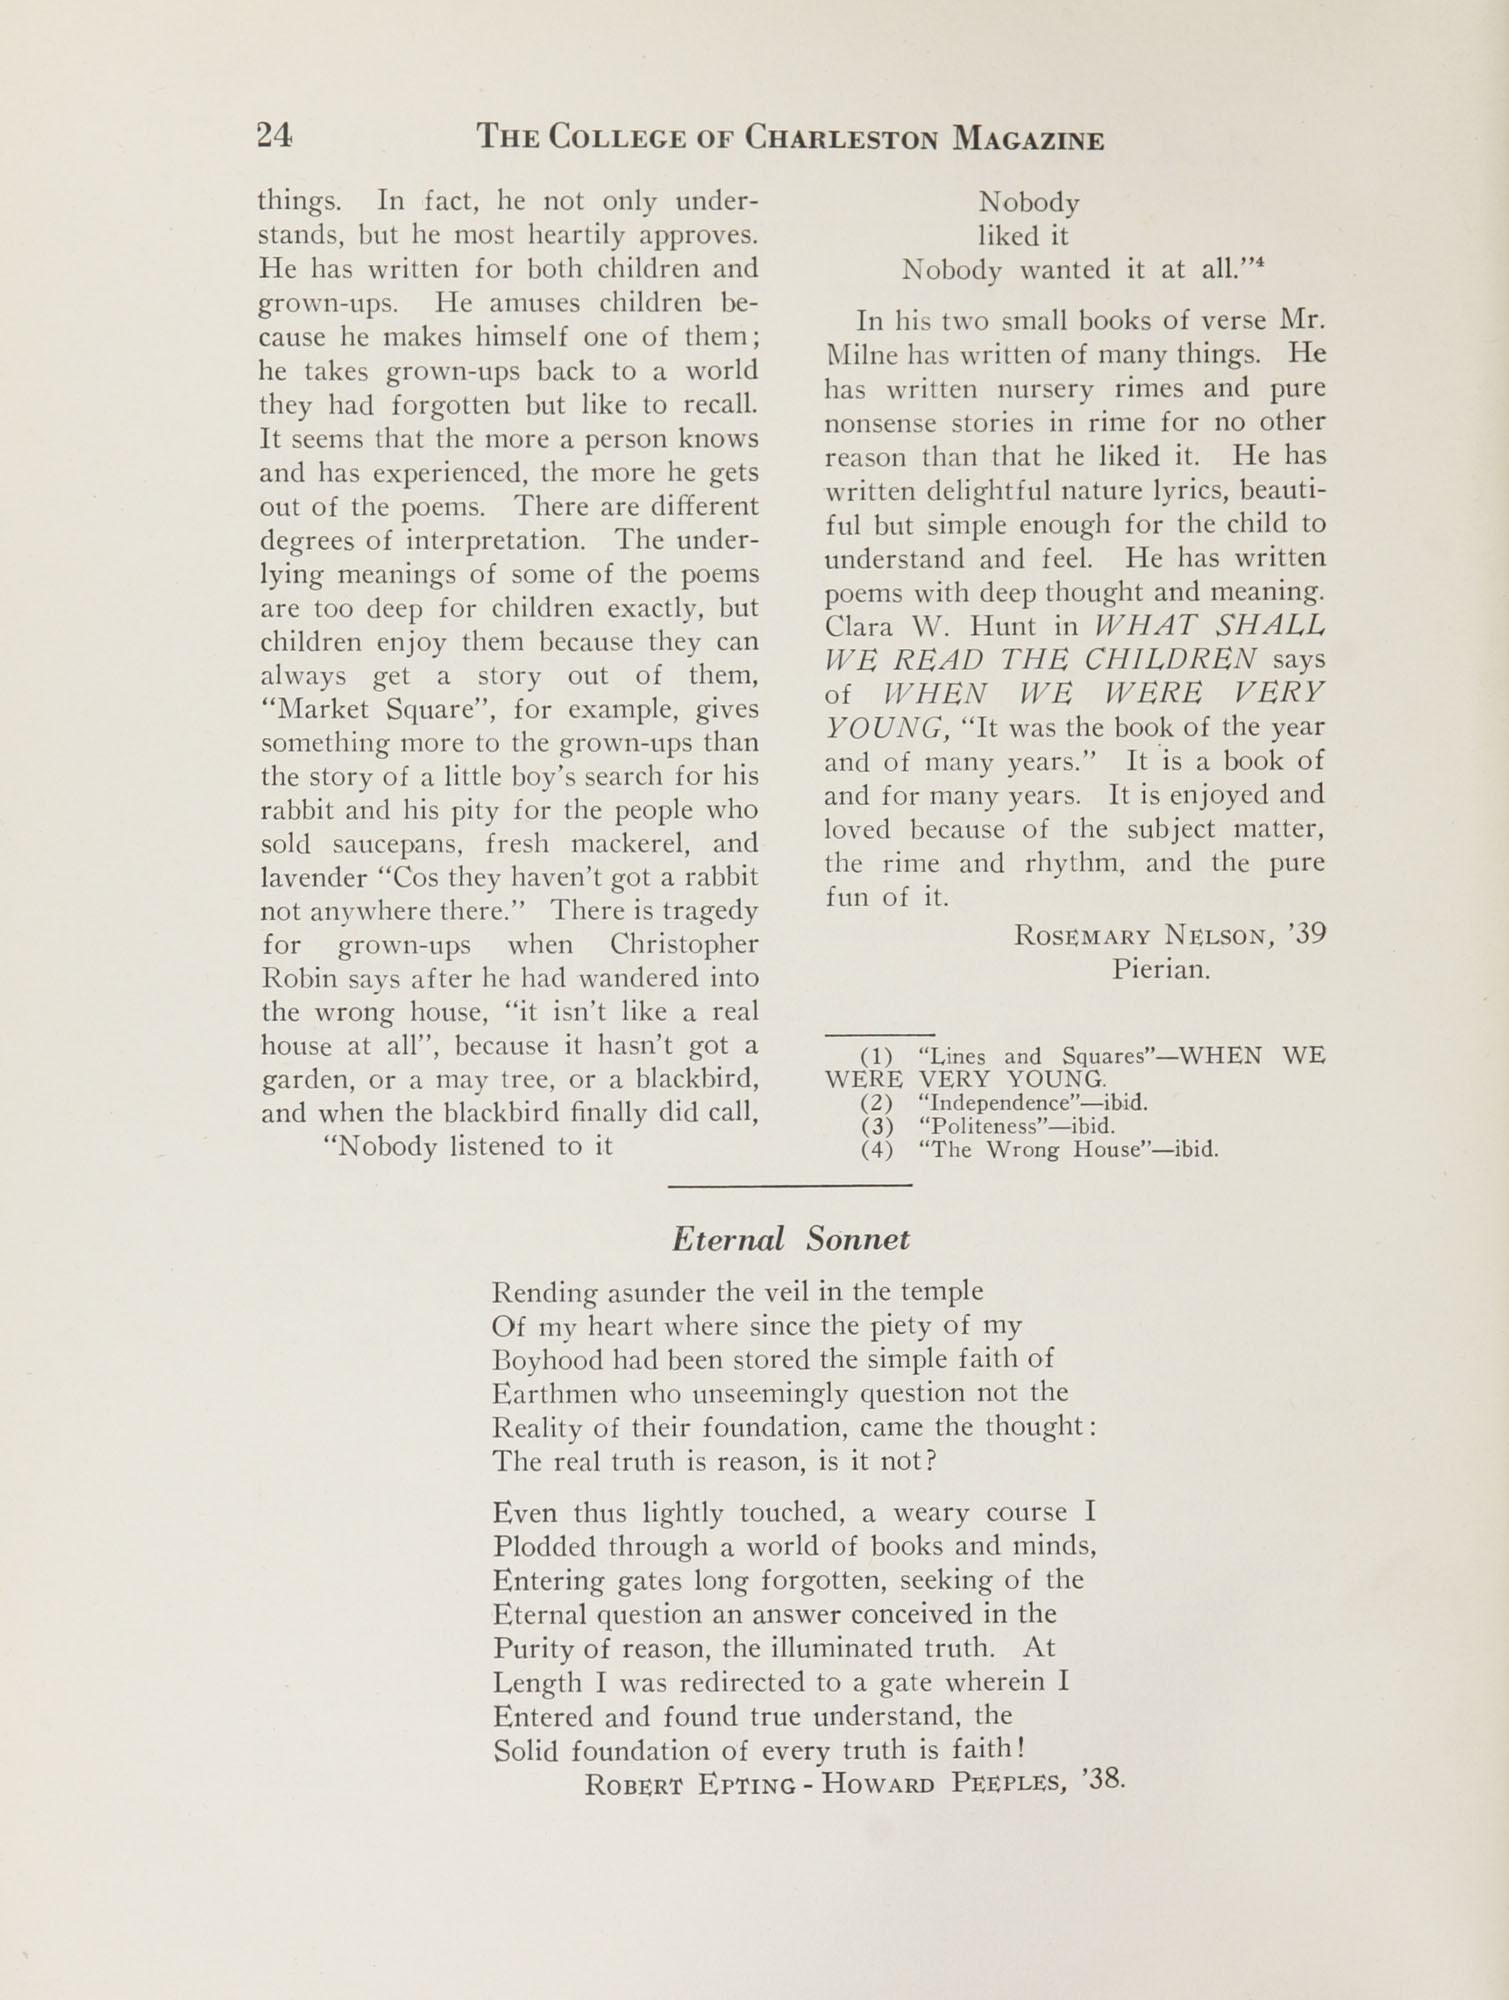 College of Charleston Magazine, 1937-1938, Vol. XXXXI No. 1, page 24